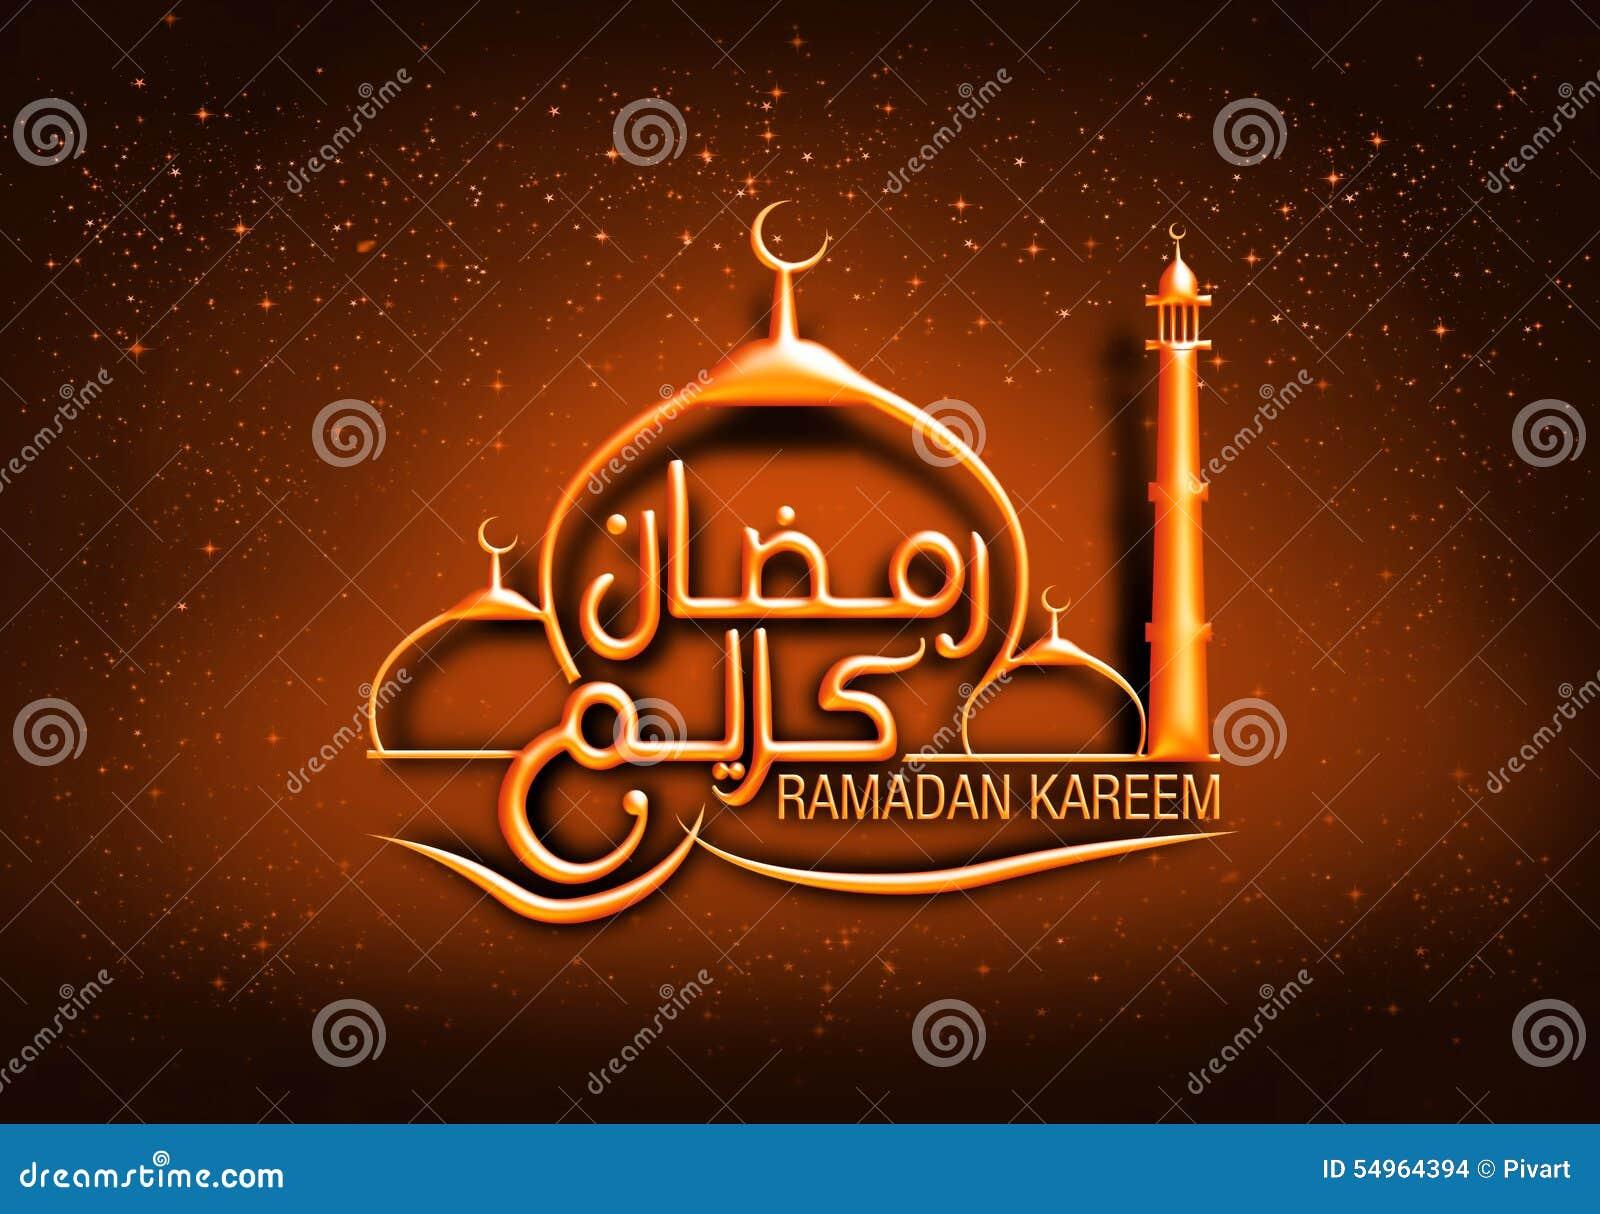 Arabic And English Islamic Calligraphy Text Ramadan Kareem